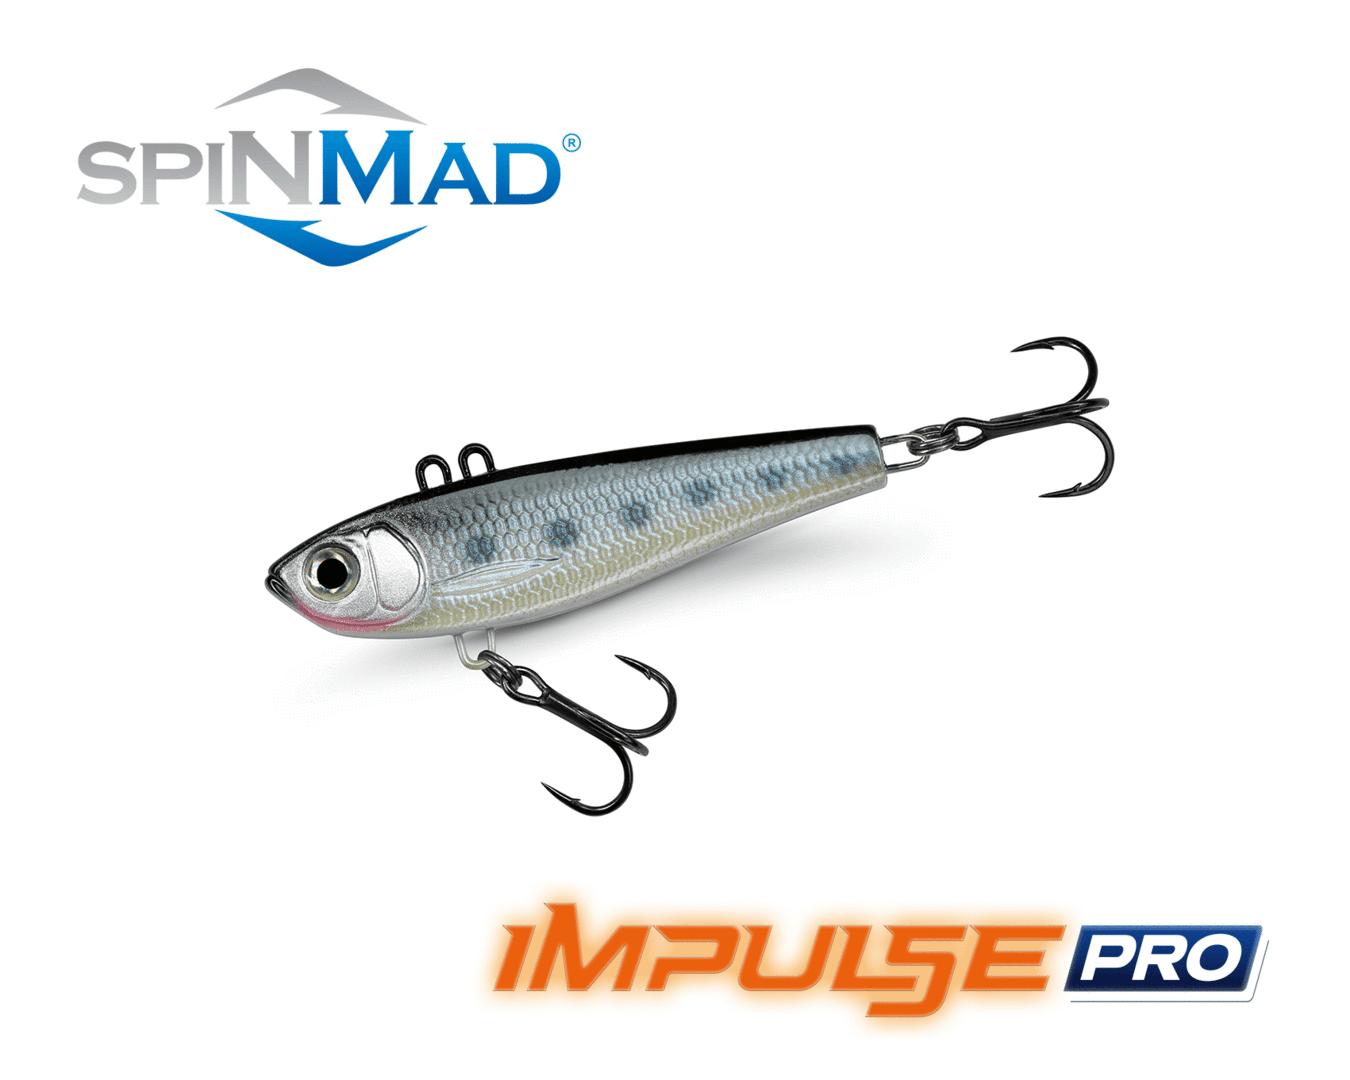 Spinmad Impulse Pro 2804